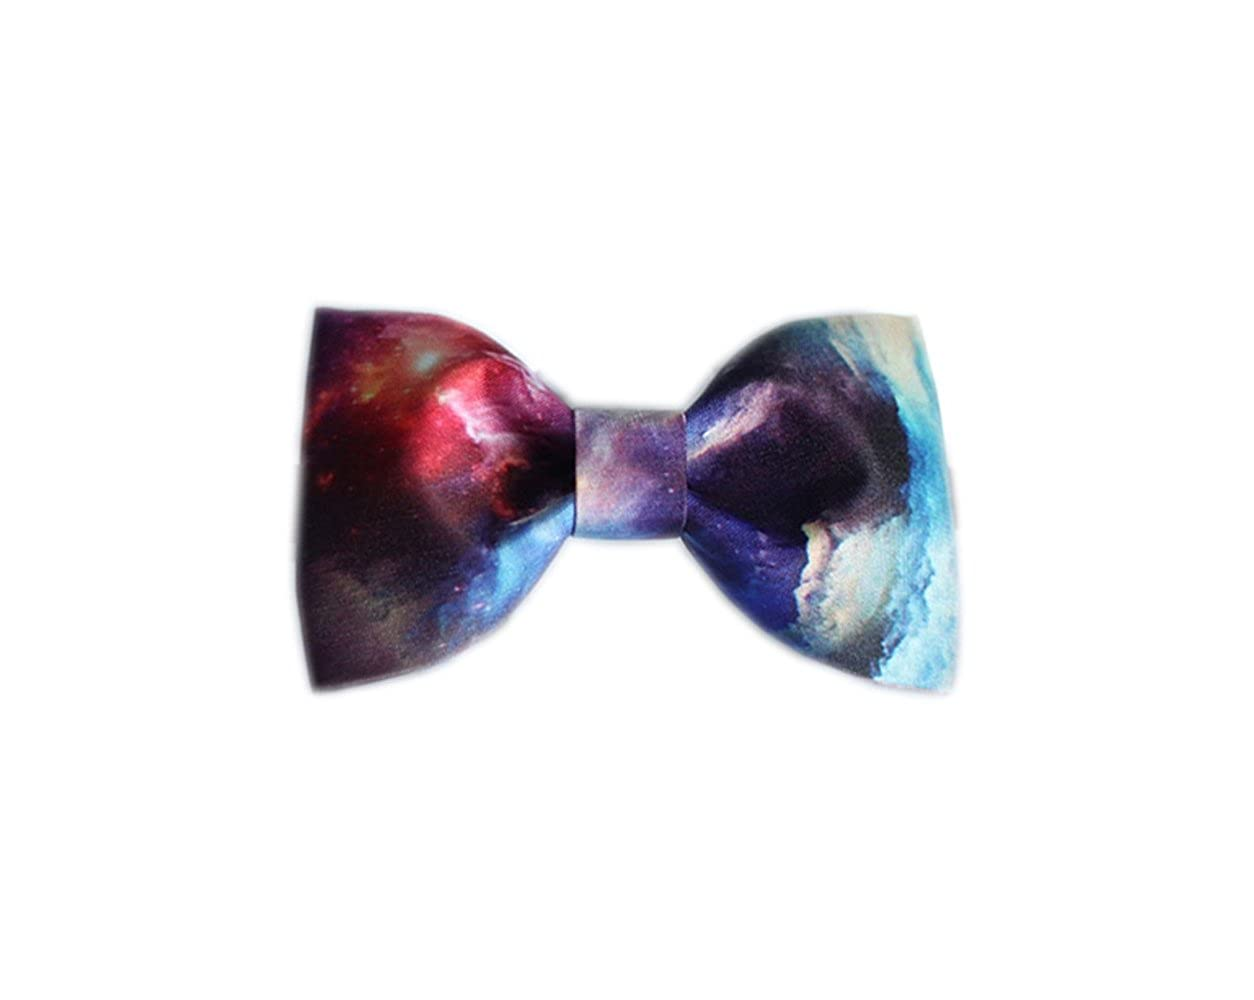 Cloud Rack Bow Tie Nebula 4 Printed Bow